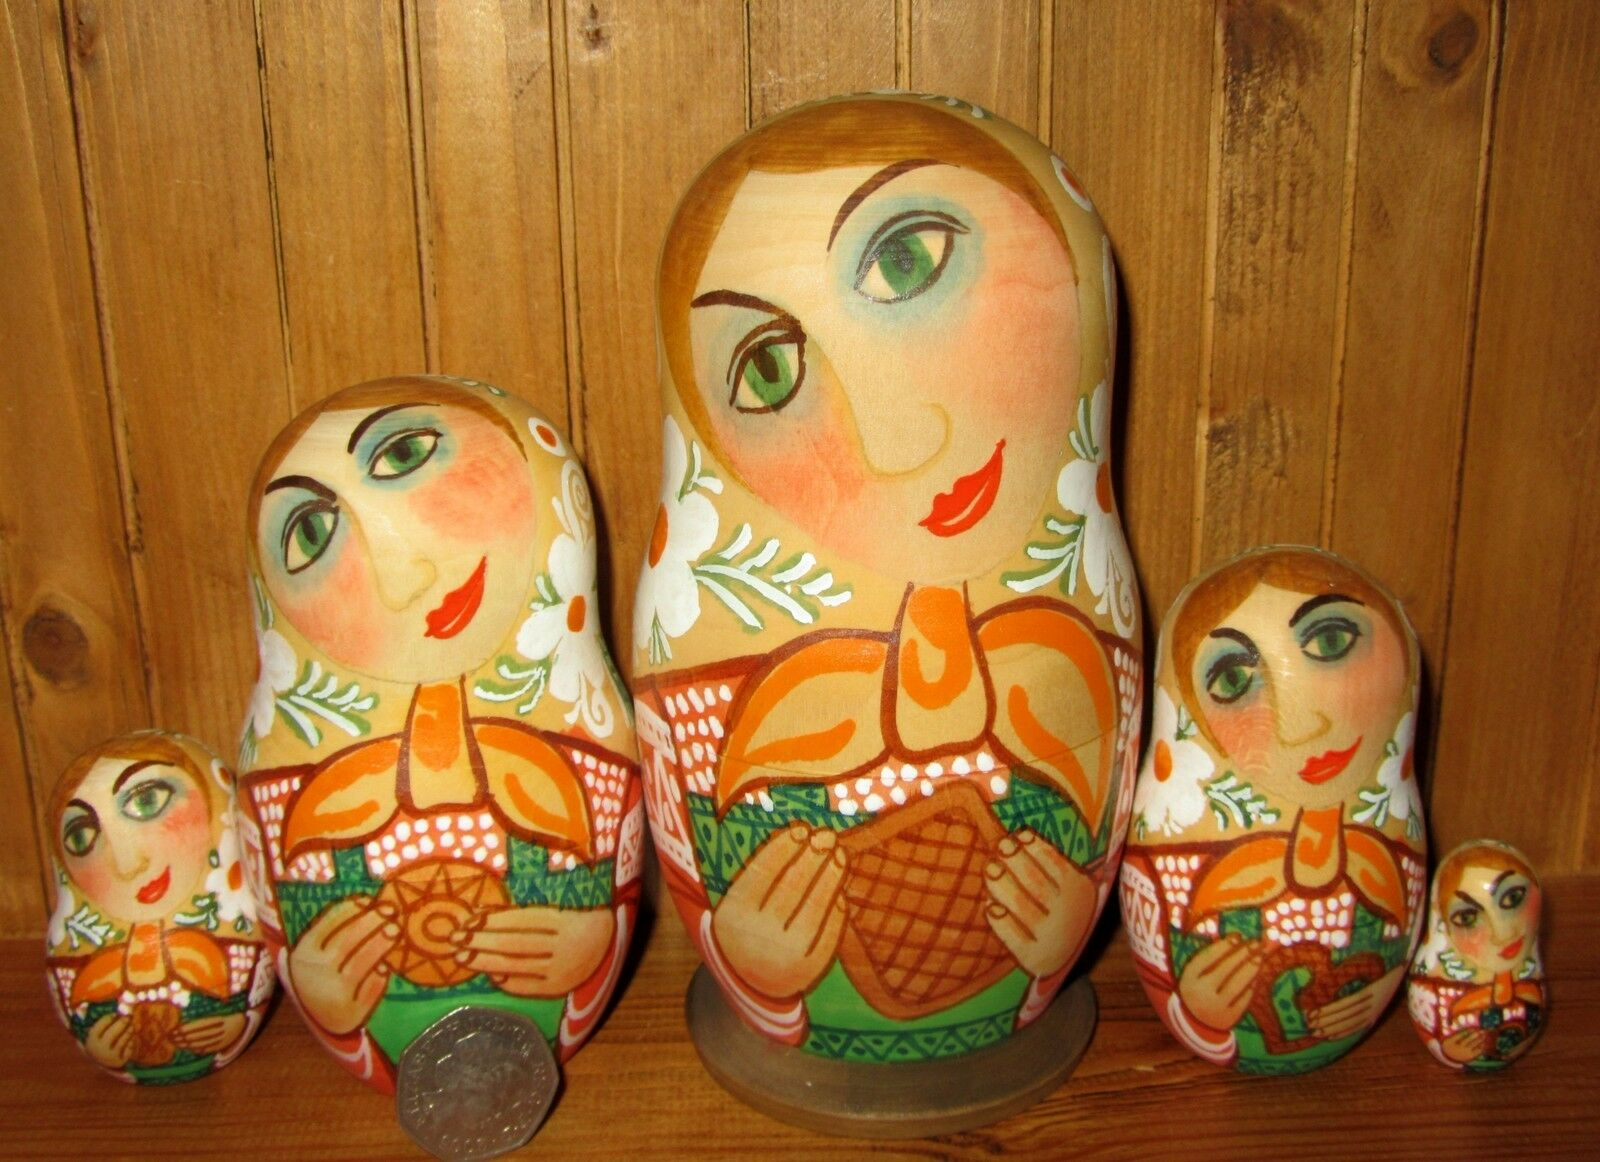 Bambole Matrioska Dalla Russia 5 Dipinto a Mano OPACO Bambine & Biscotti